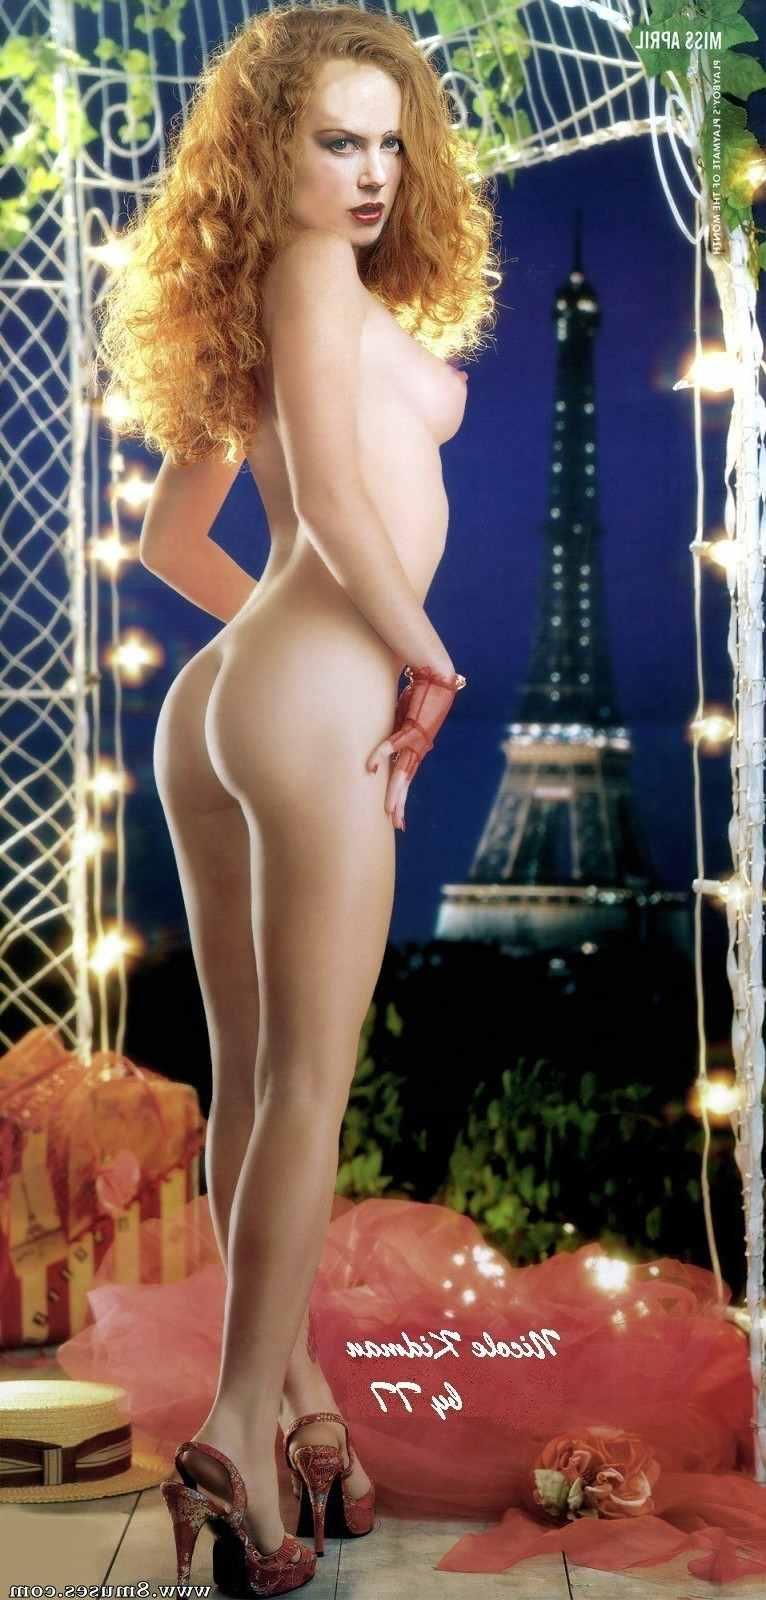 Fake-Celebrities-Sex-Pictures/Nicole-Kidman Nicole_Kidman__8muses_-_Sex_and_Porn_Comics_713.jpg